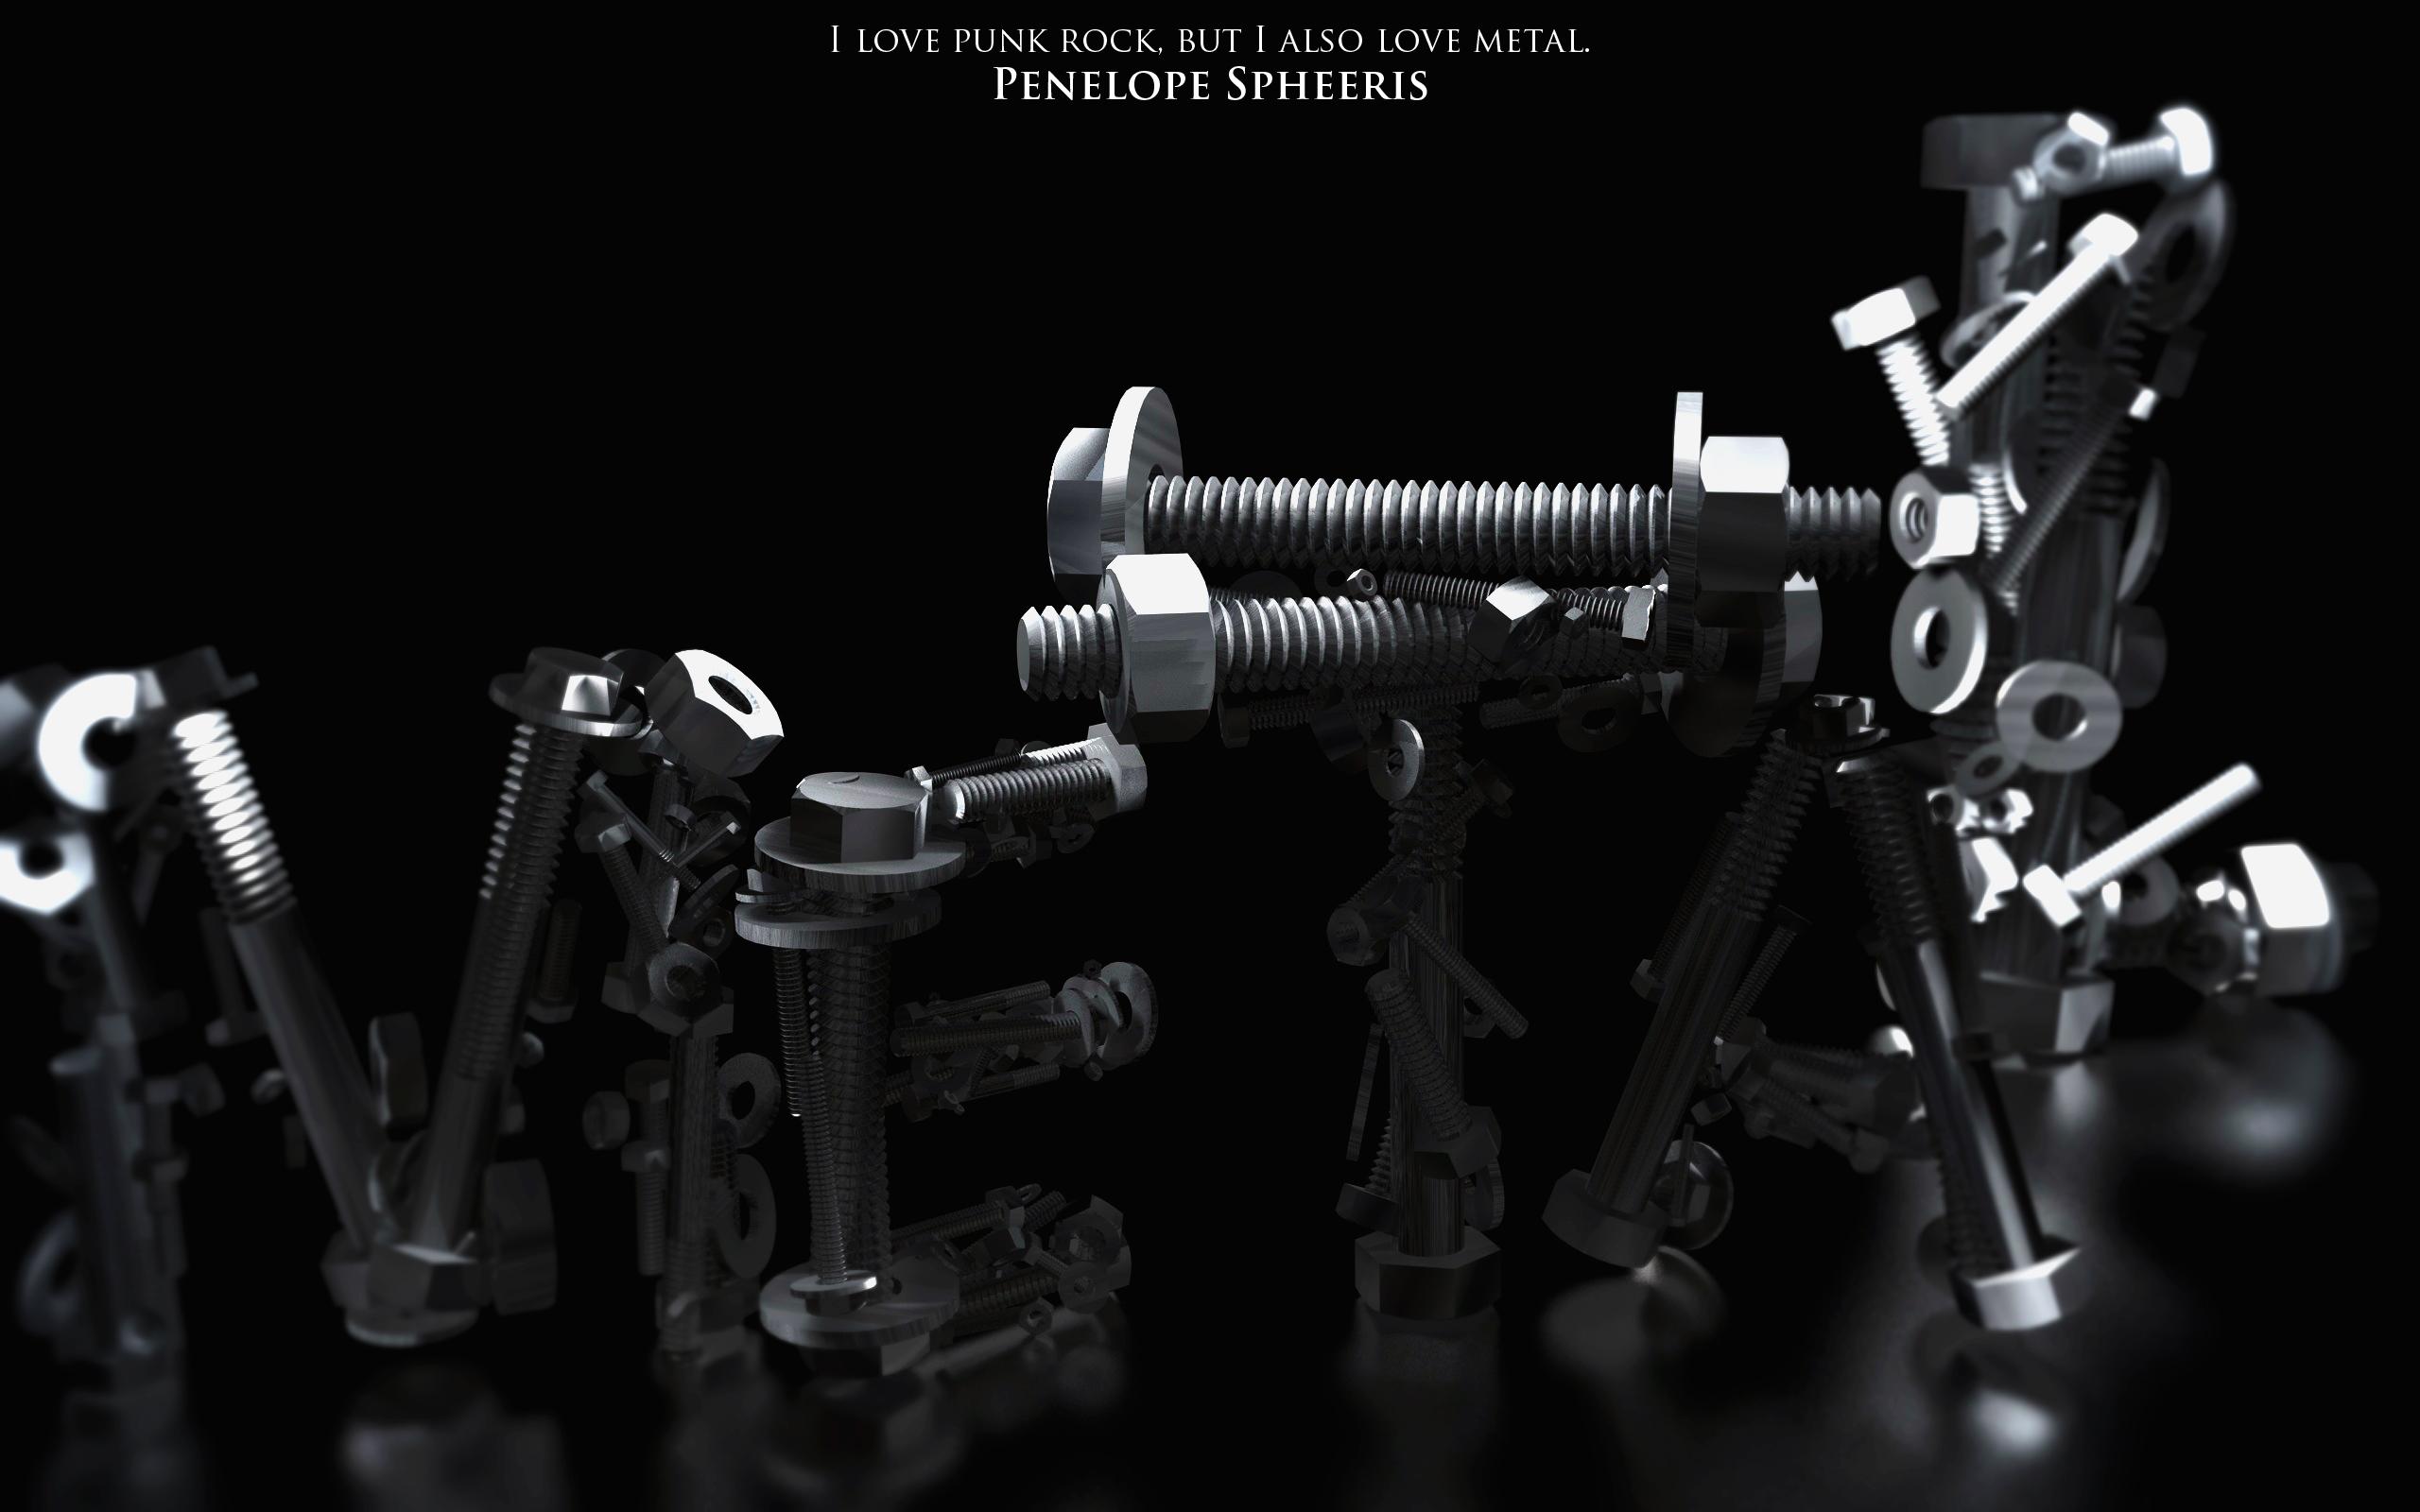 Metal Typography by PhreshSoldier